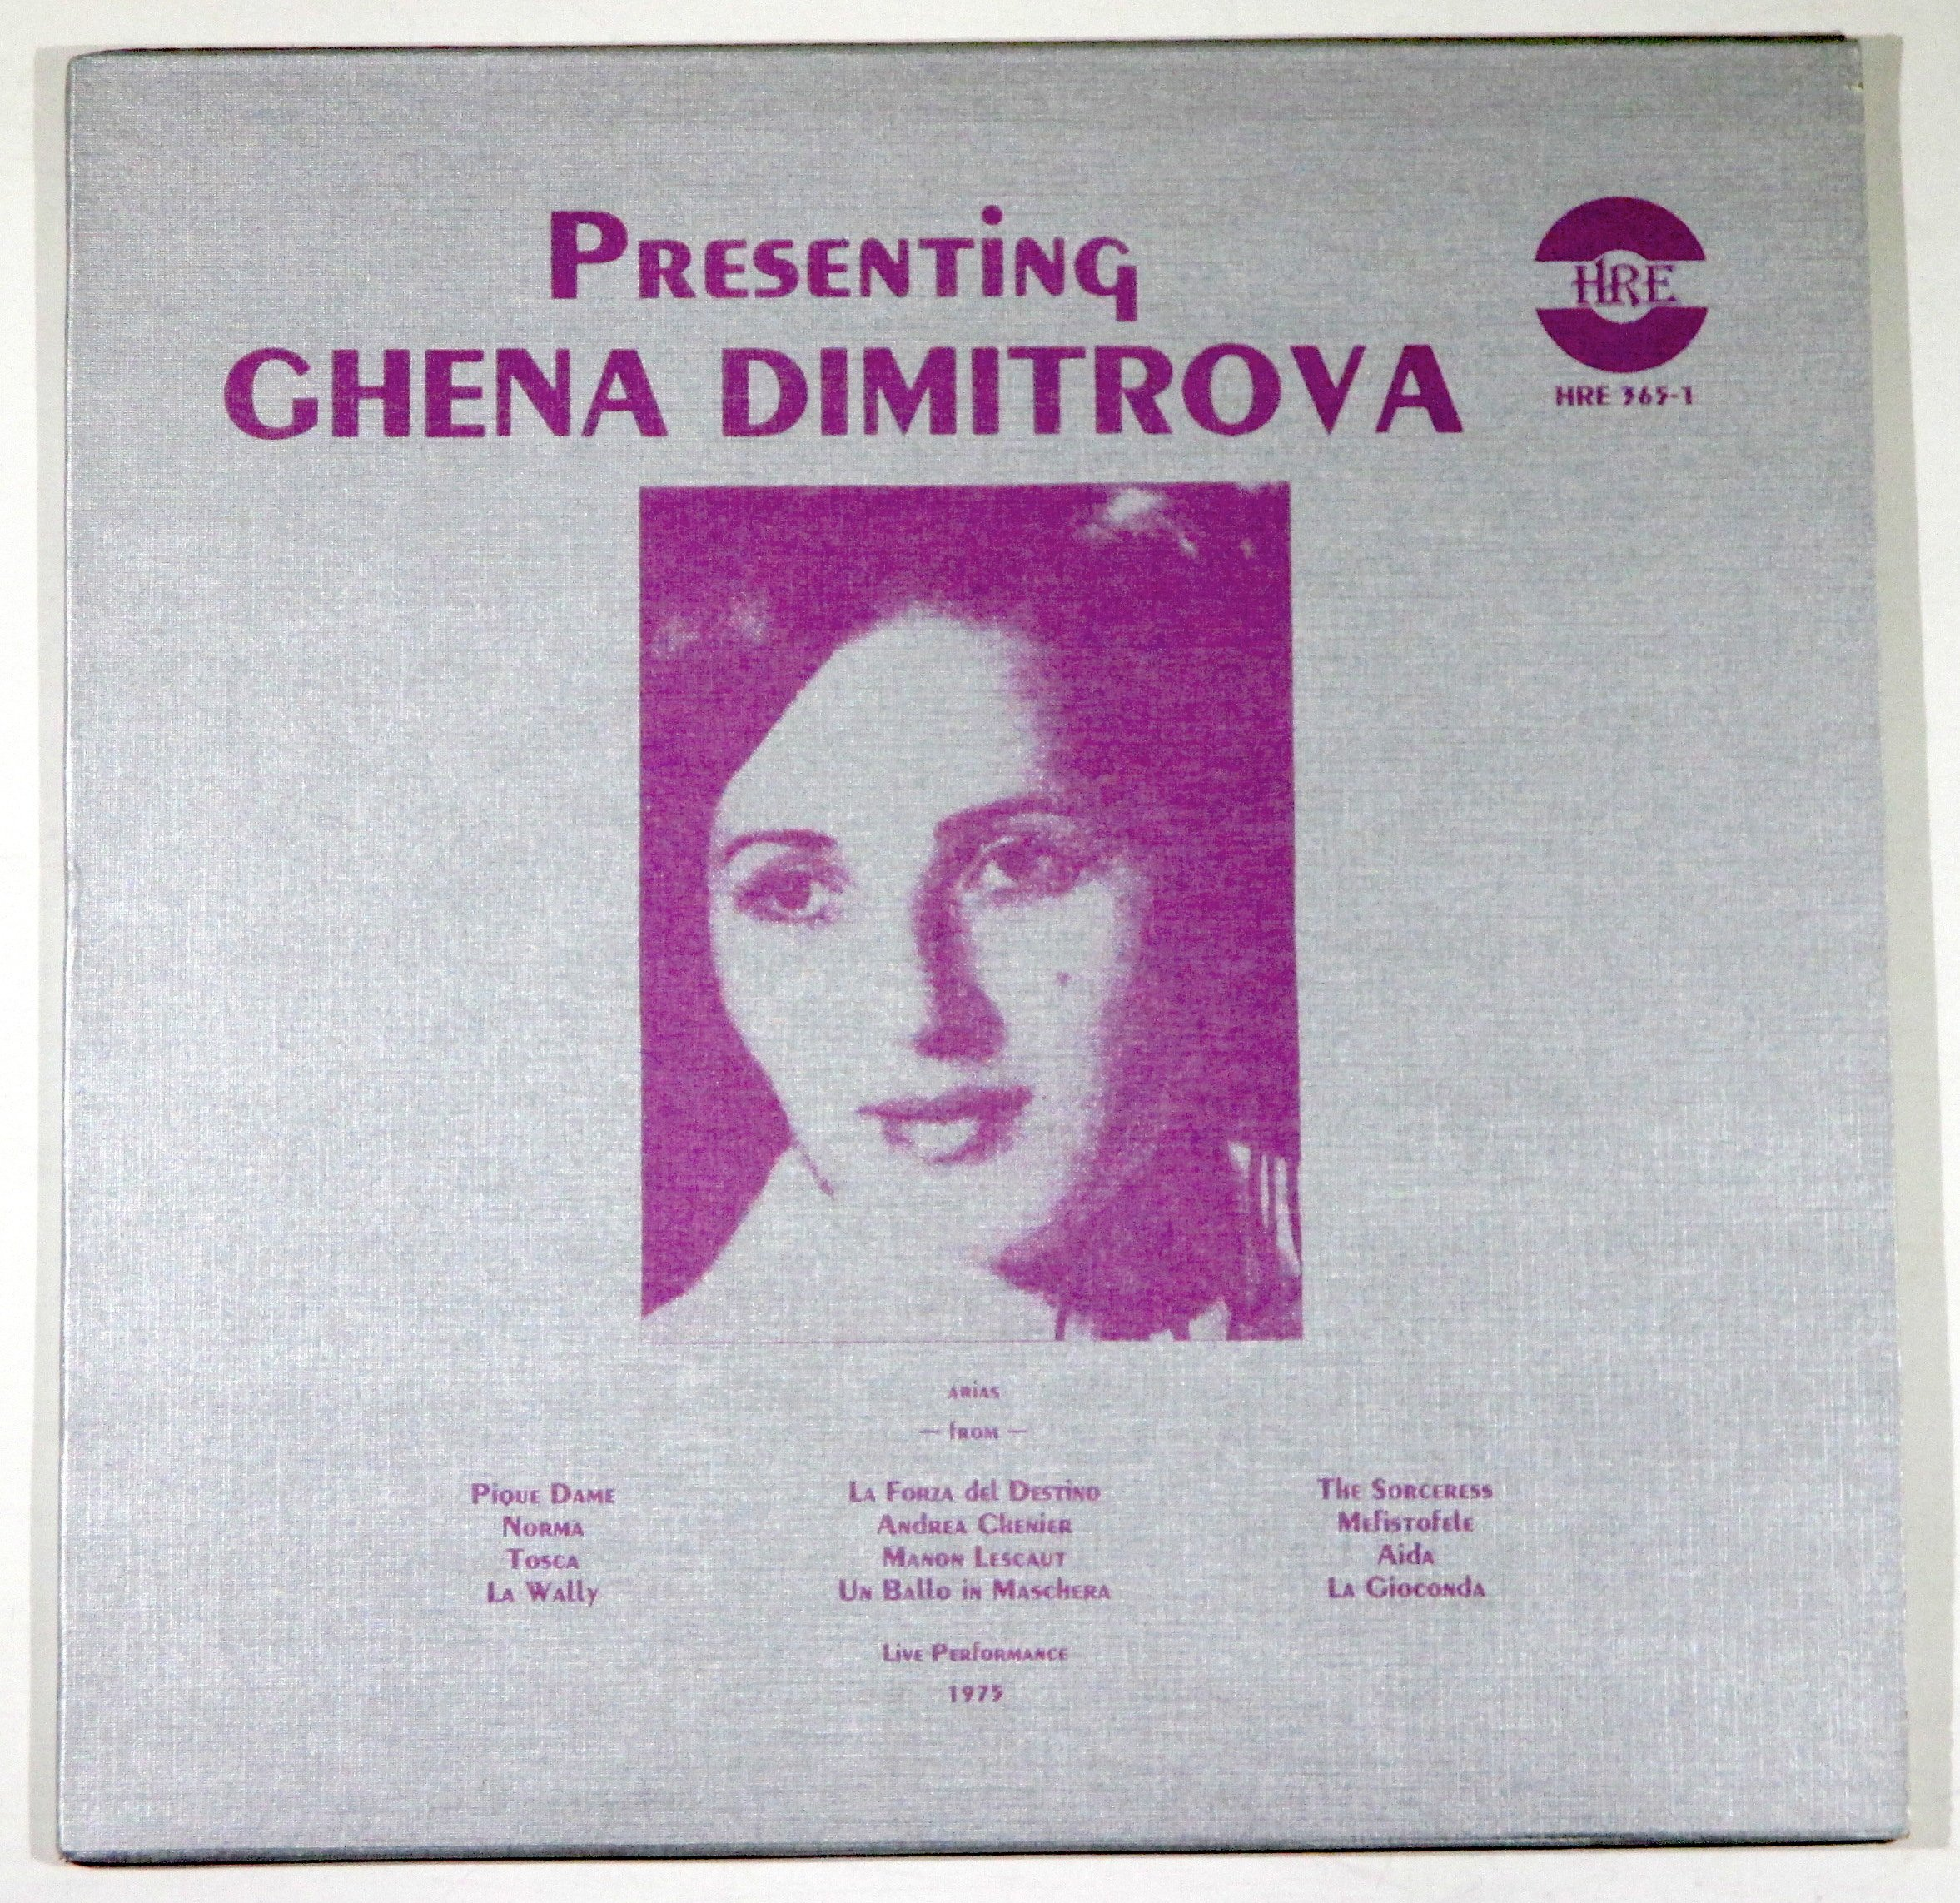 Presenting Ghena Dimitrova Arias (Live Performance 1975)